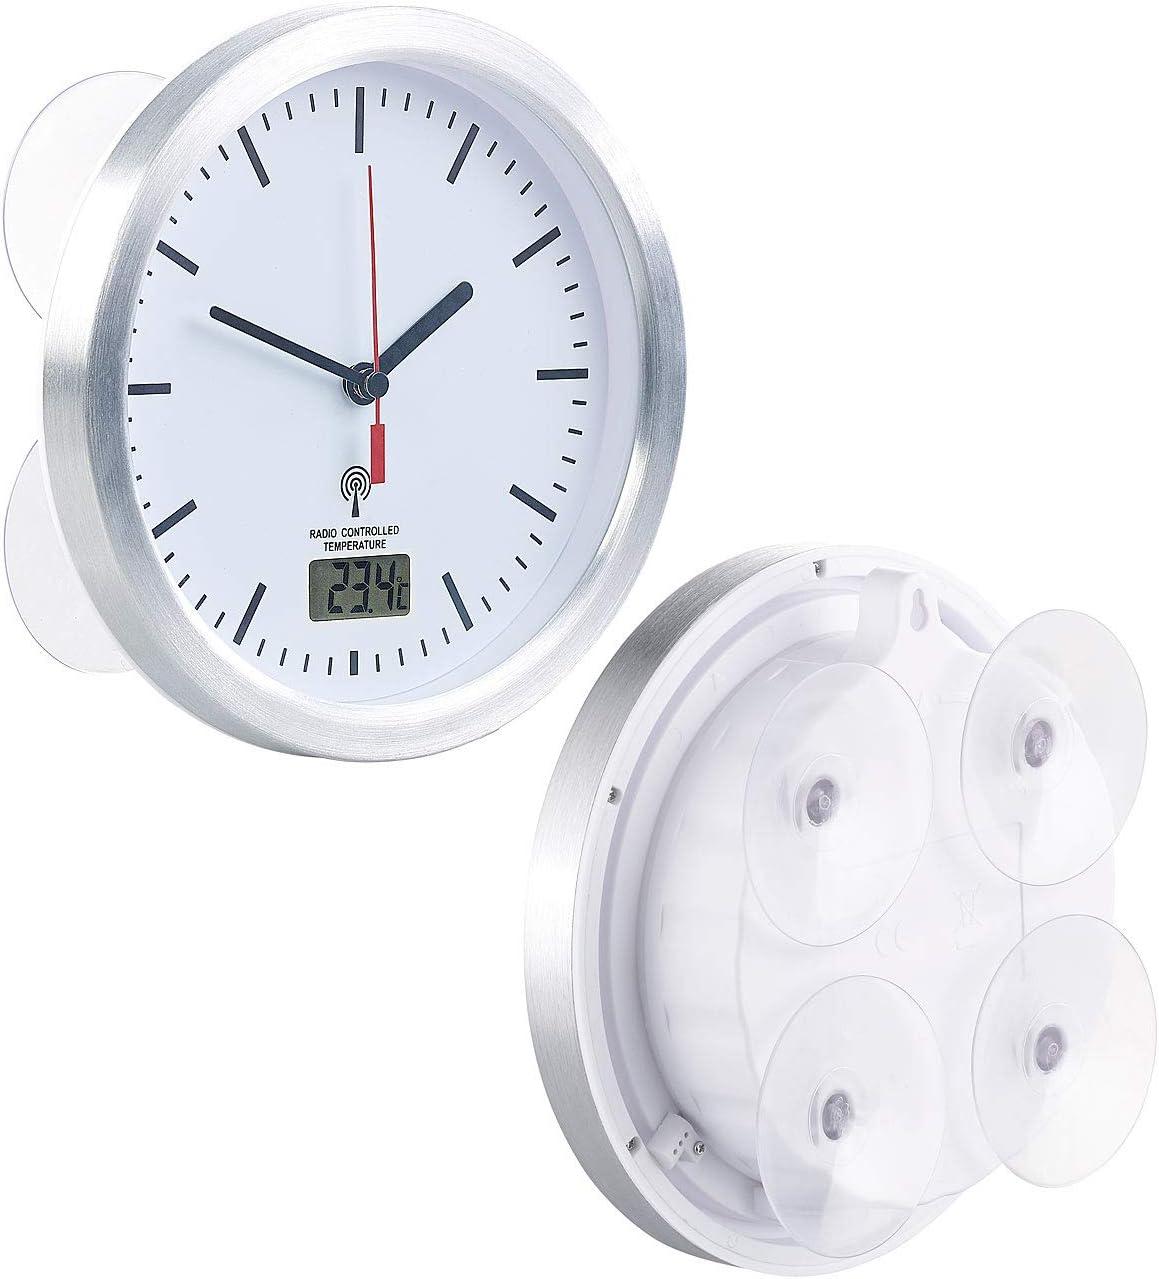 St. Leonhard Badezimmer Funkuhr: Badezimmer-Funk-Wanduhr mit Thermometer &  Saugnäpfen, Alu-Rahmen, IPX11 (Badezimmer Funkuhr mit Saugnapf)